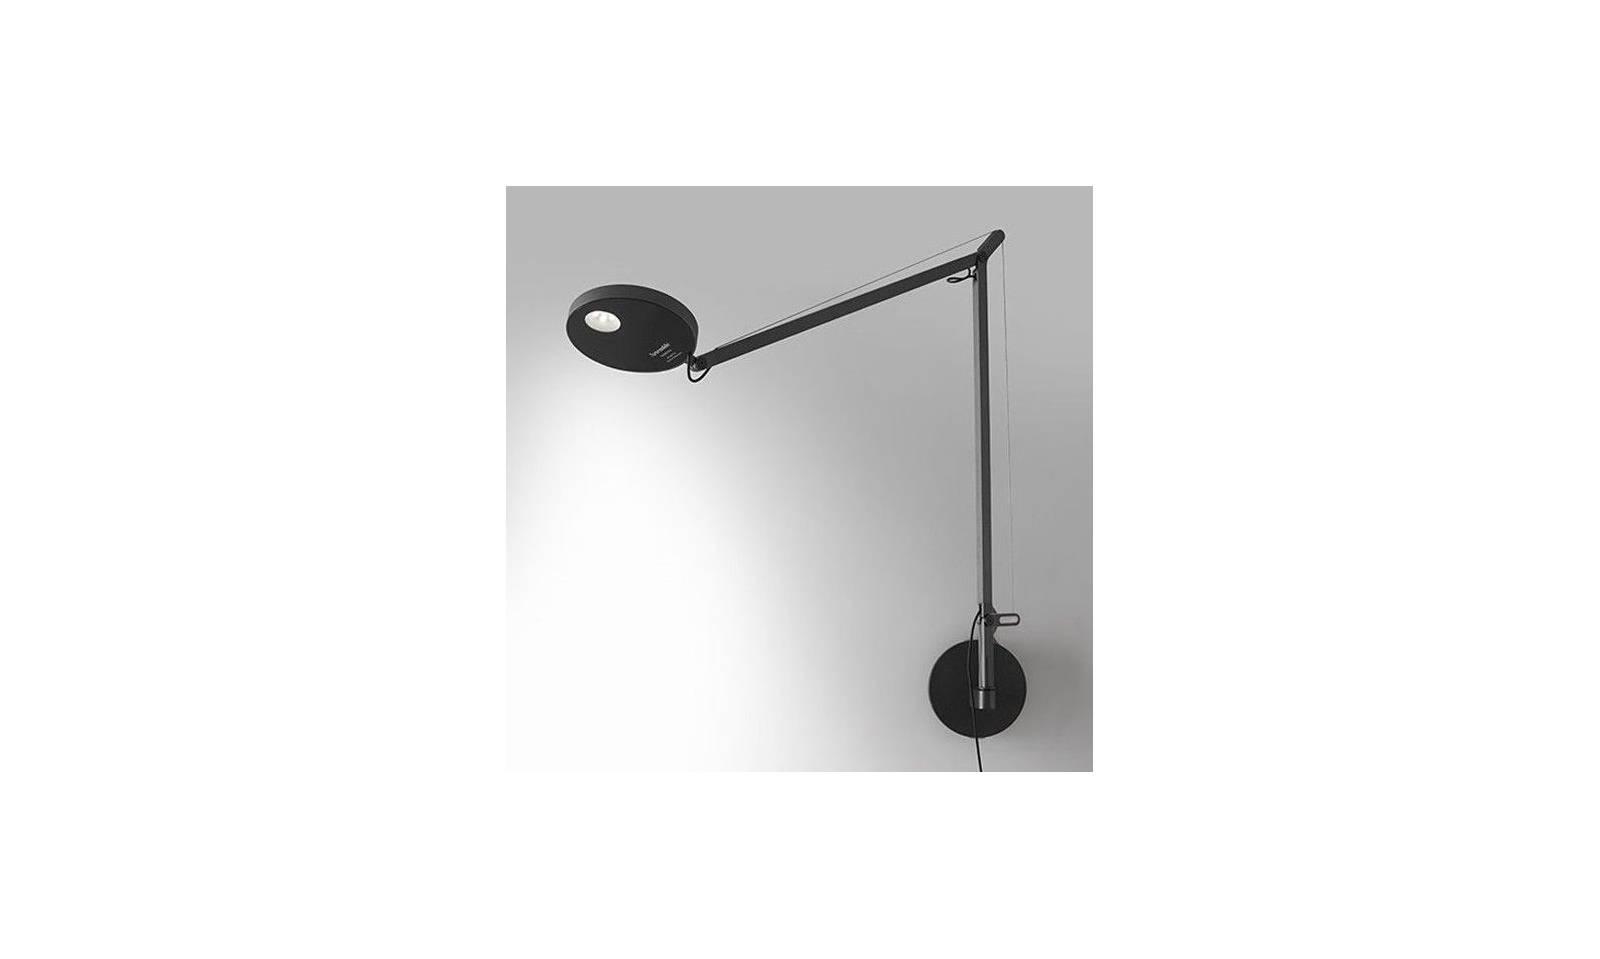 Artemide lampada da parete led in alluminio serie demetra - Lampada parete artemide ...